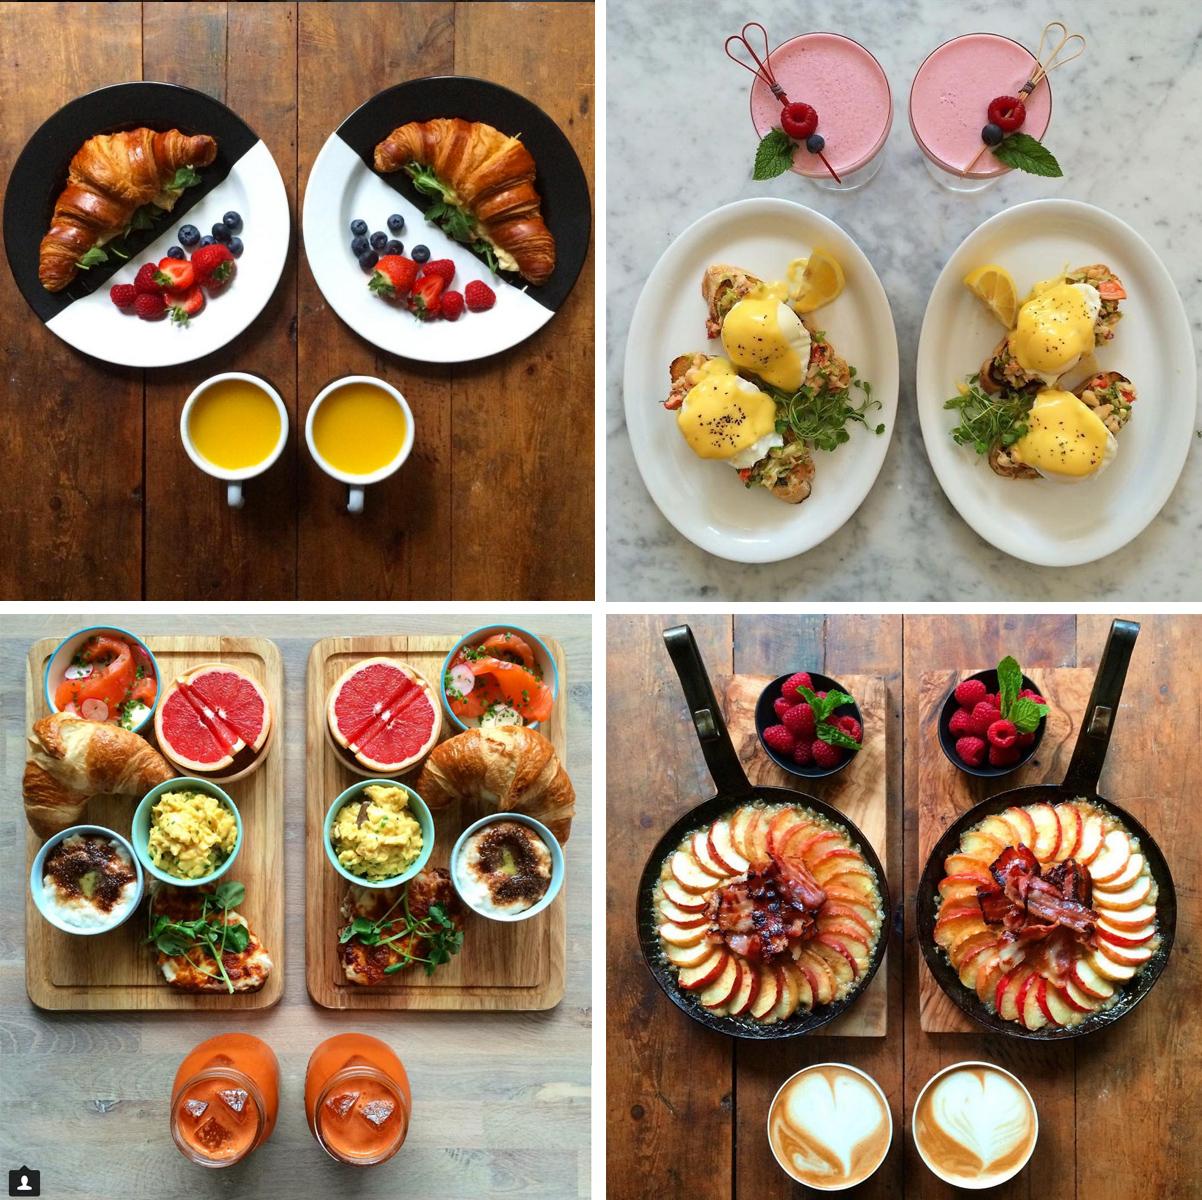 Symmetrybreakfast – Husligheter